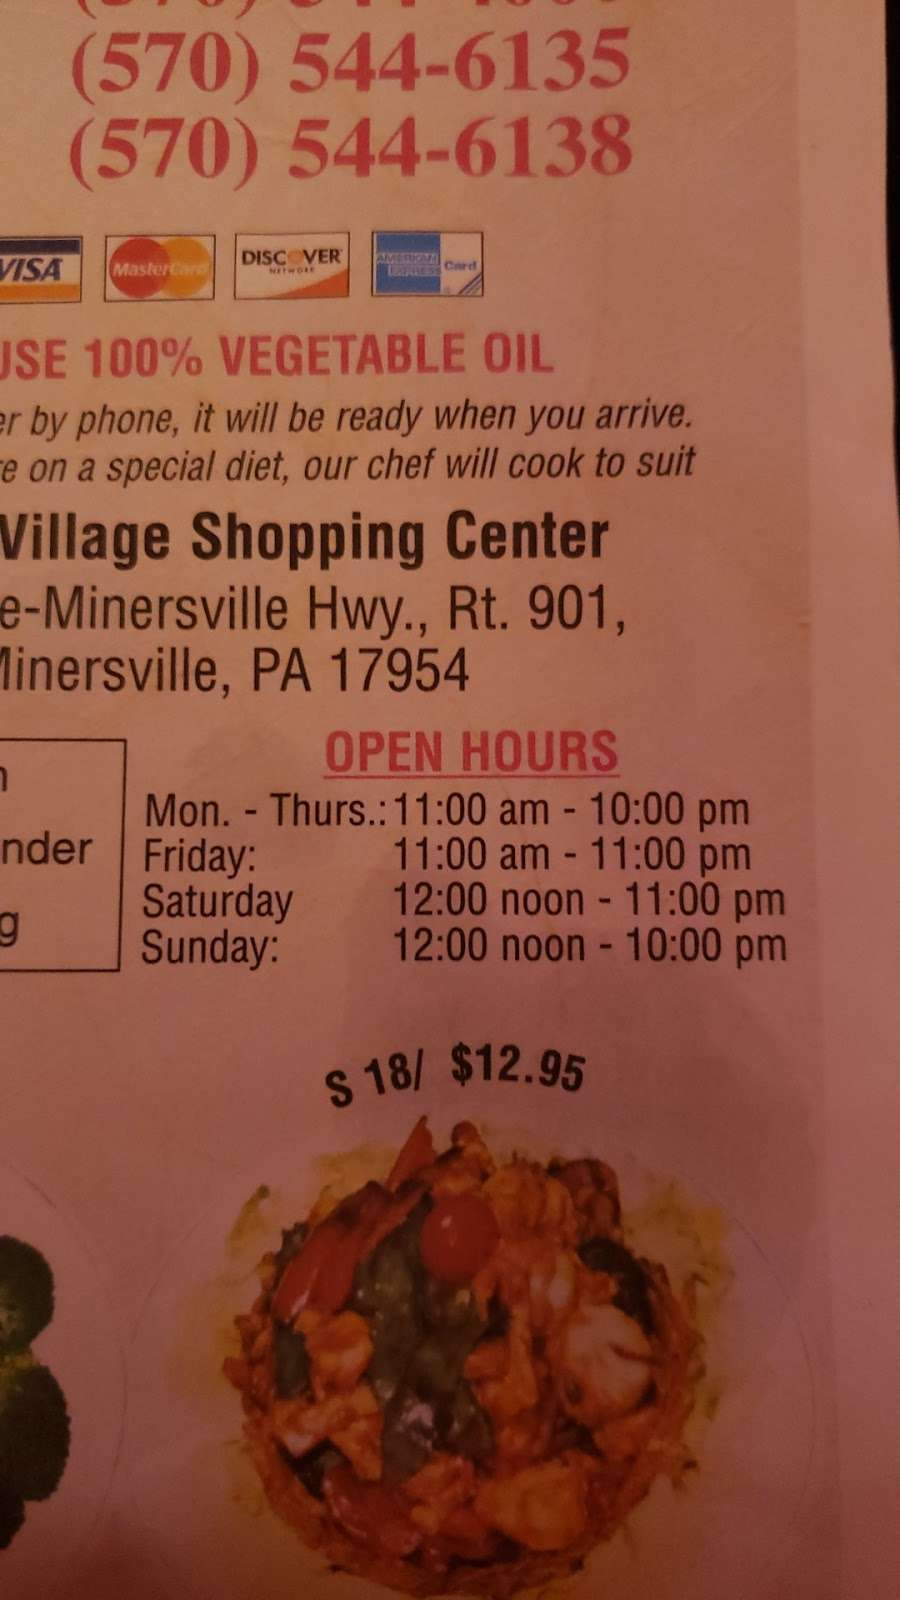 Hong Kong - restaurant  | Photo 3 of 3 | Address: Kings Shopping Ctr, Minersville, PA 17954, USA | Phone: (570) 544-6135